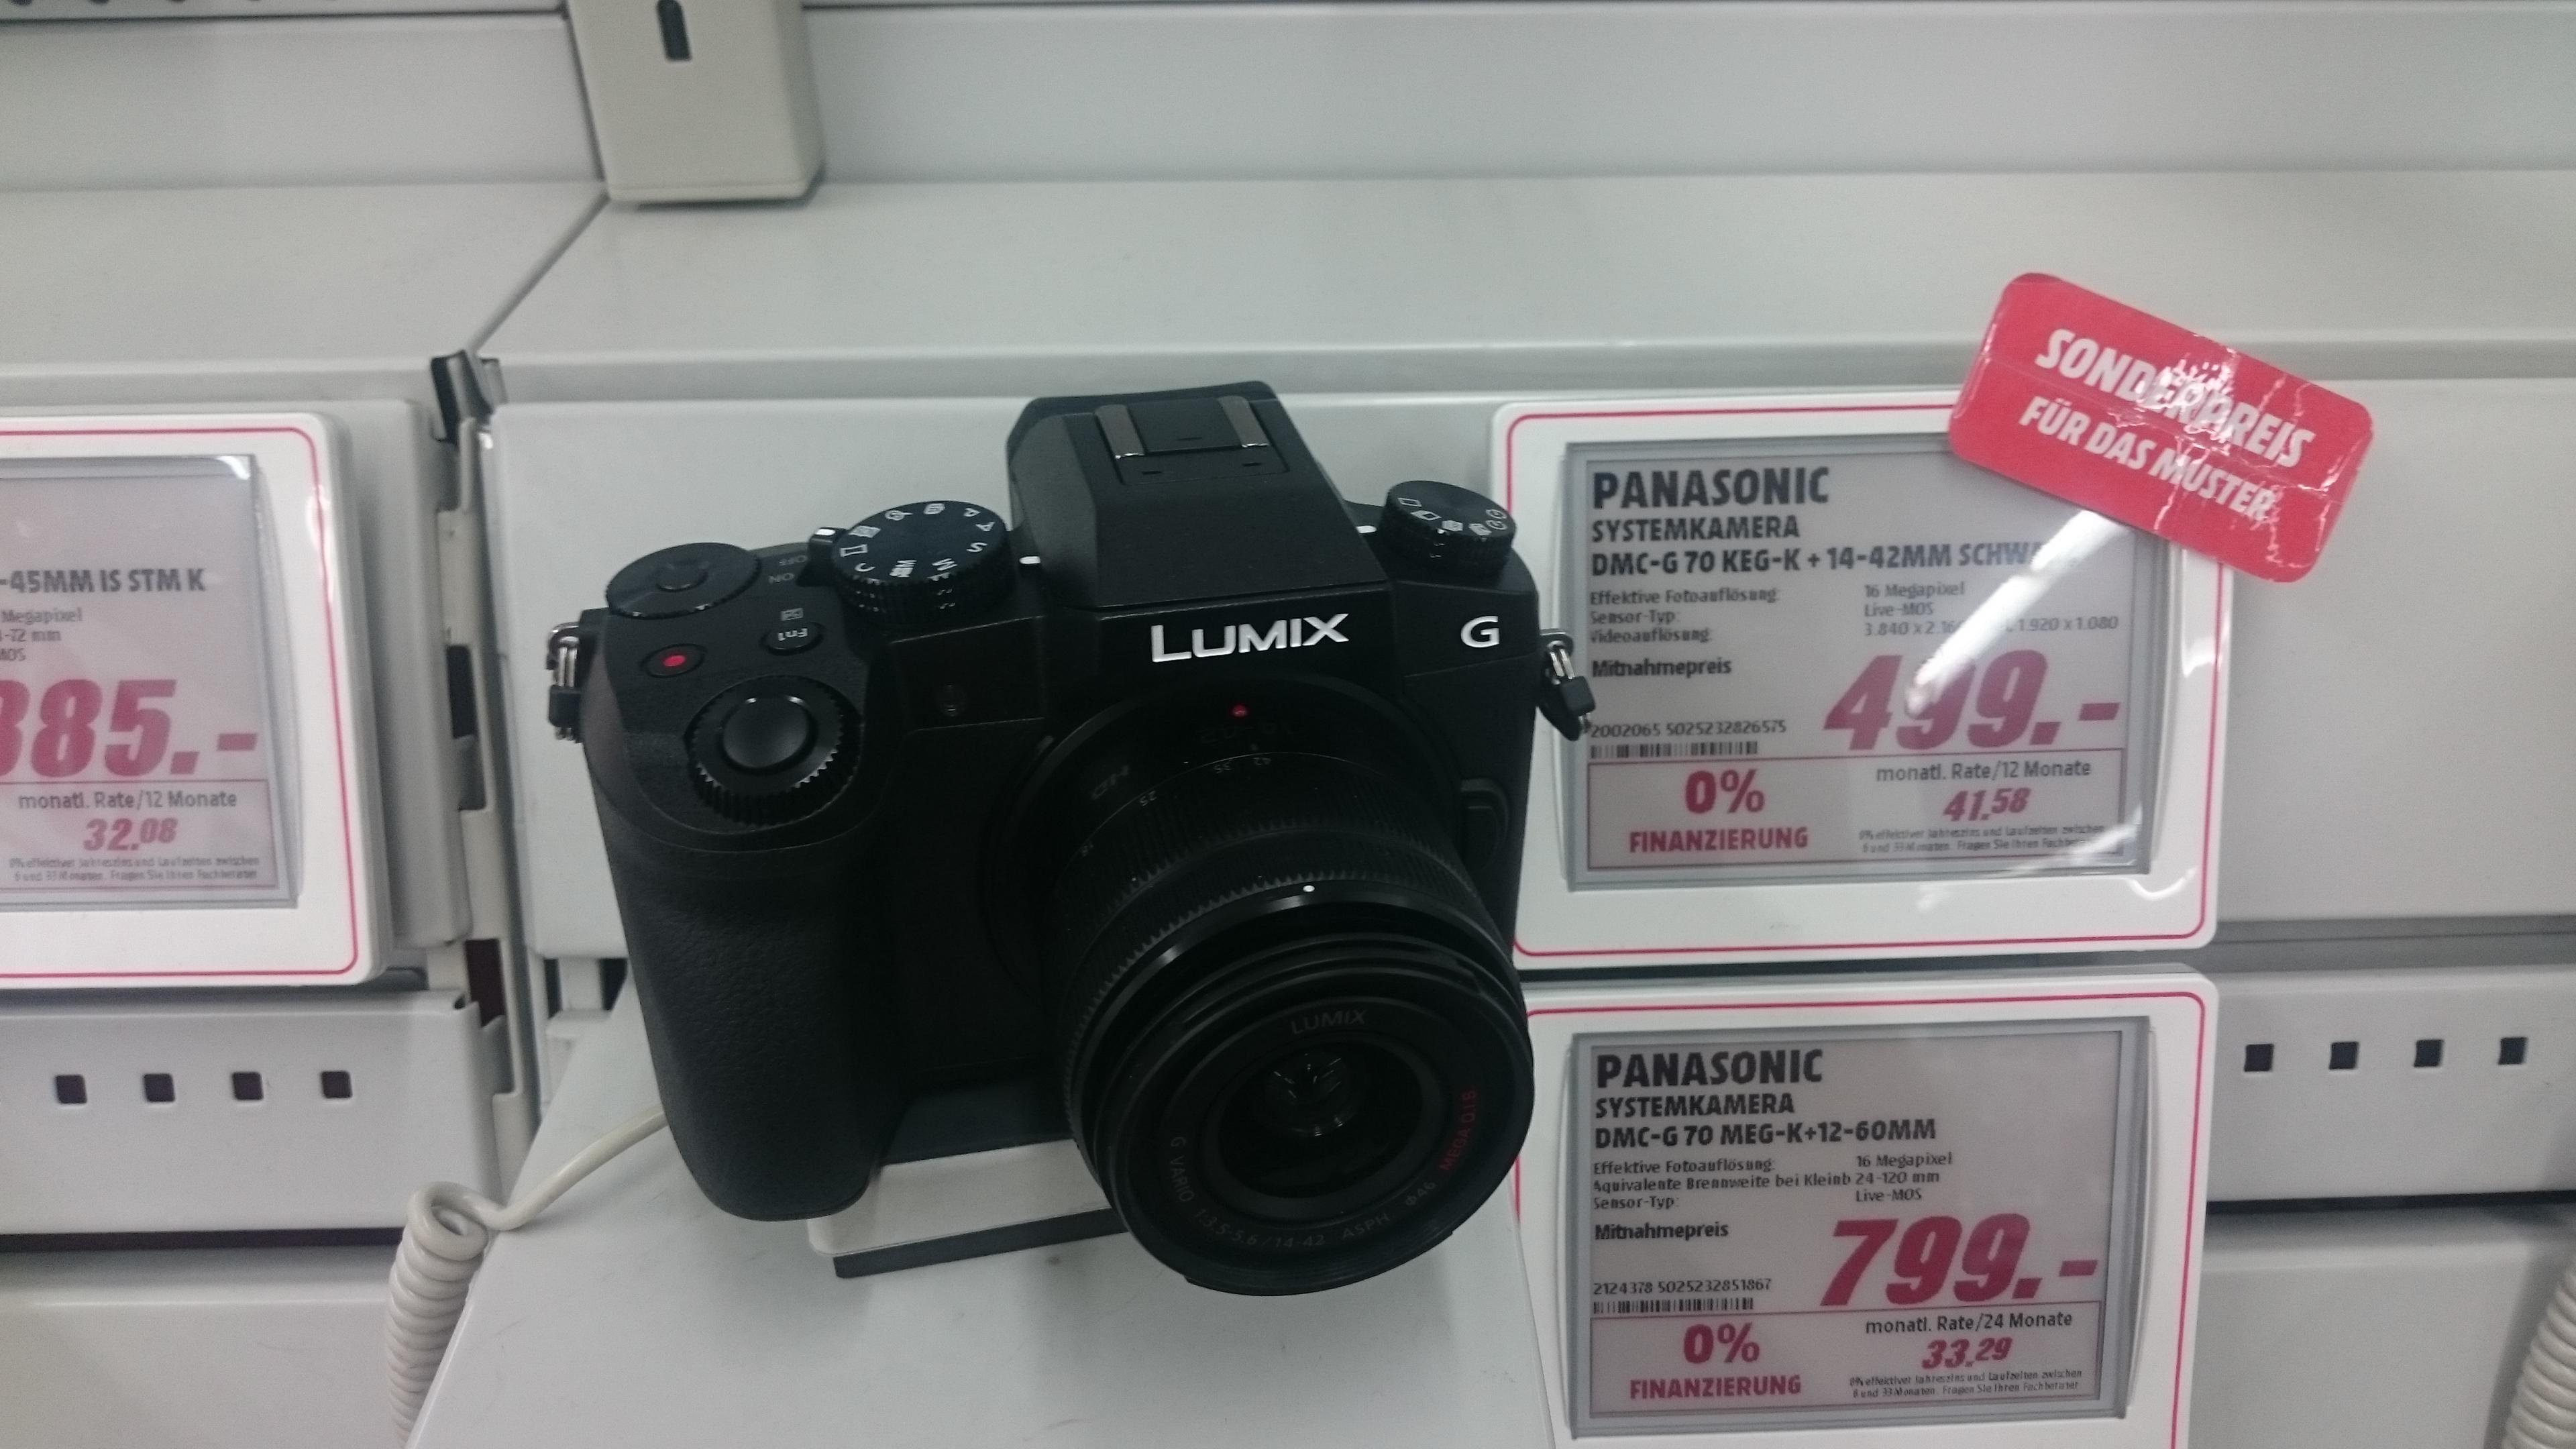 [Mediamarkt Landshut] Panasonic Lumix G70 im Kit mit 14-42 II